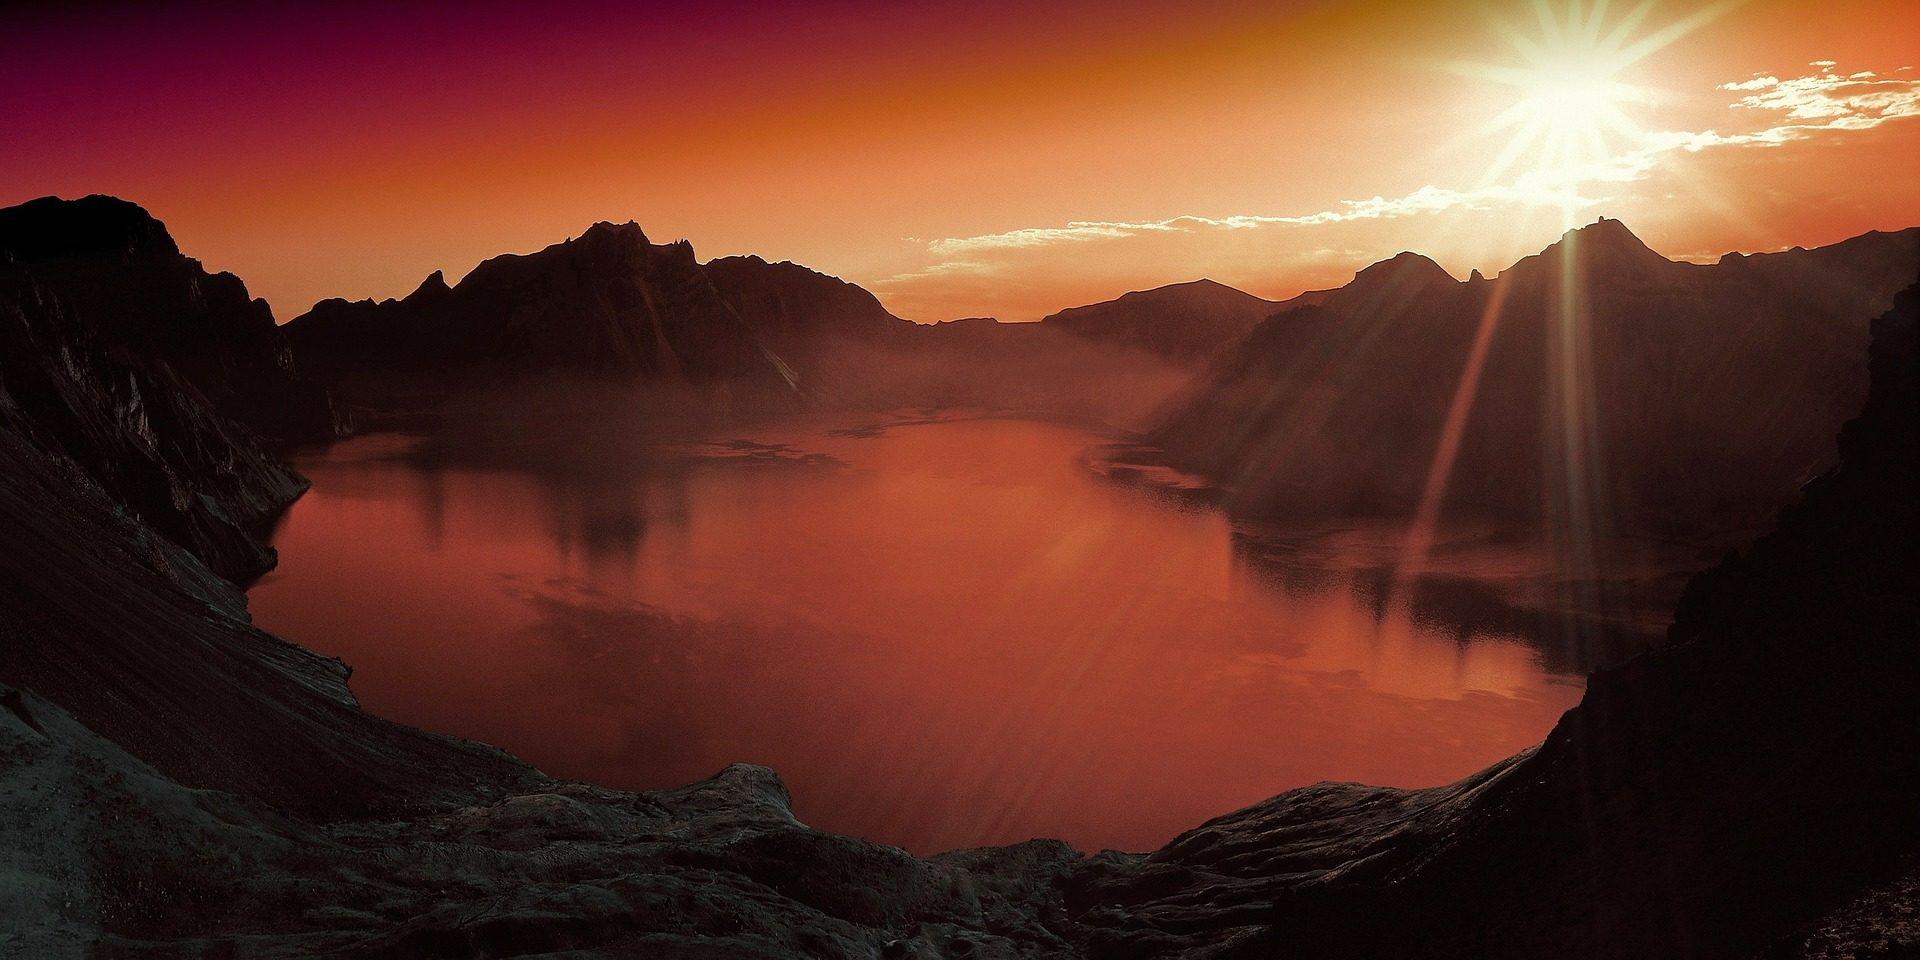 puesta, Κυρ, Λίμνη, βΗλιοβασίλεμα atardecer - Wallpapers HD - Professor-falken.com